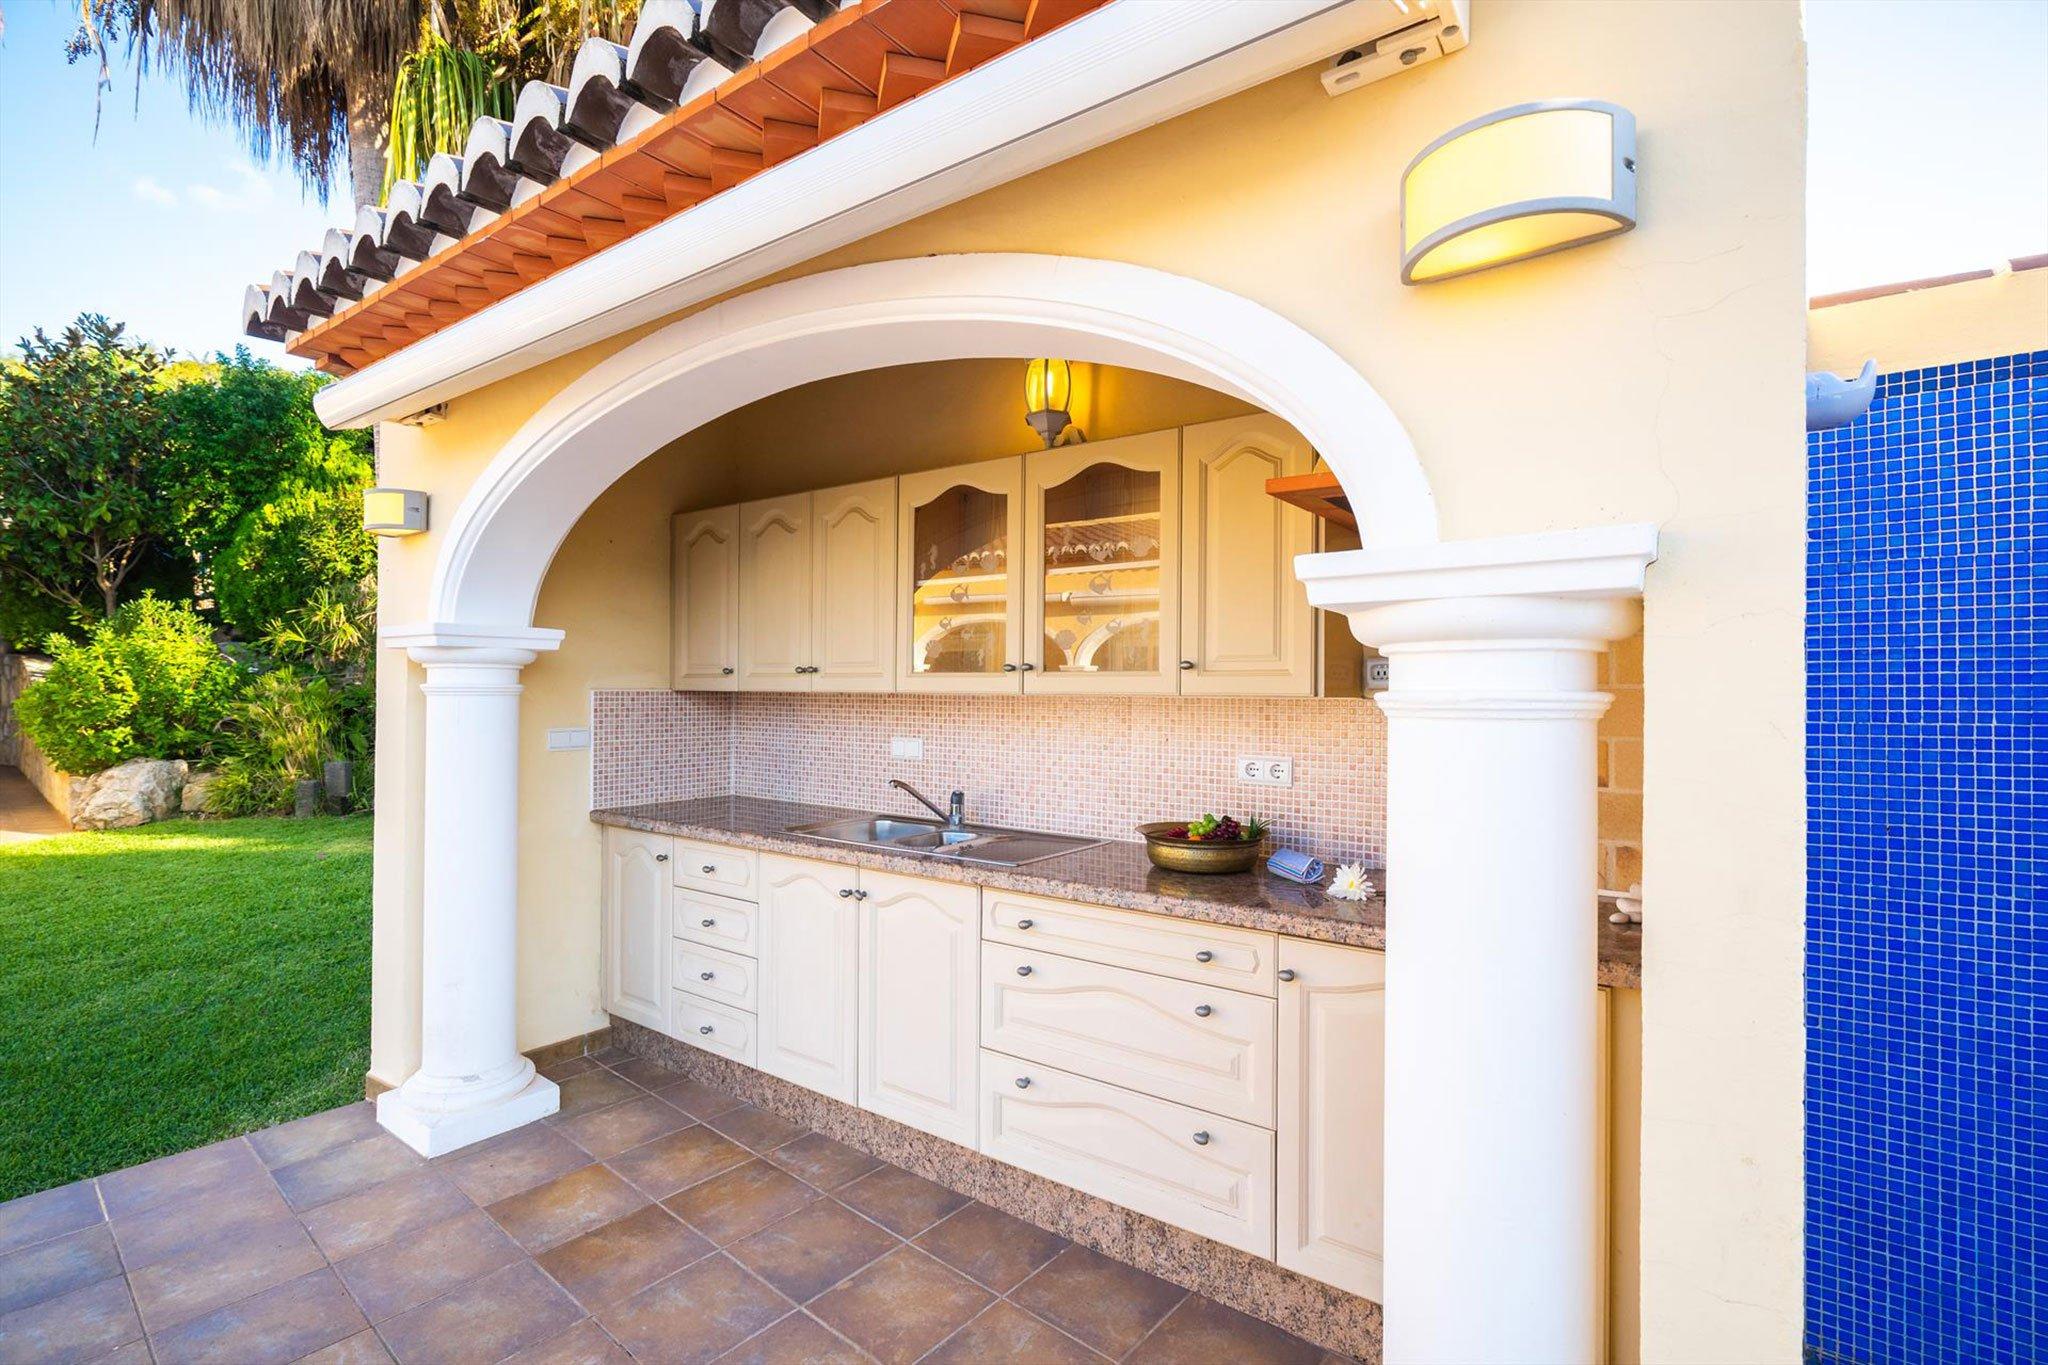 Cocina exterior en una casa de vacaciones en Jávea – Aguila Rent a Villa